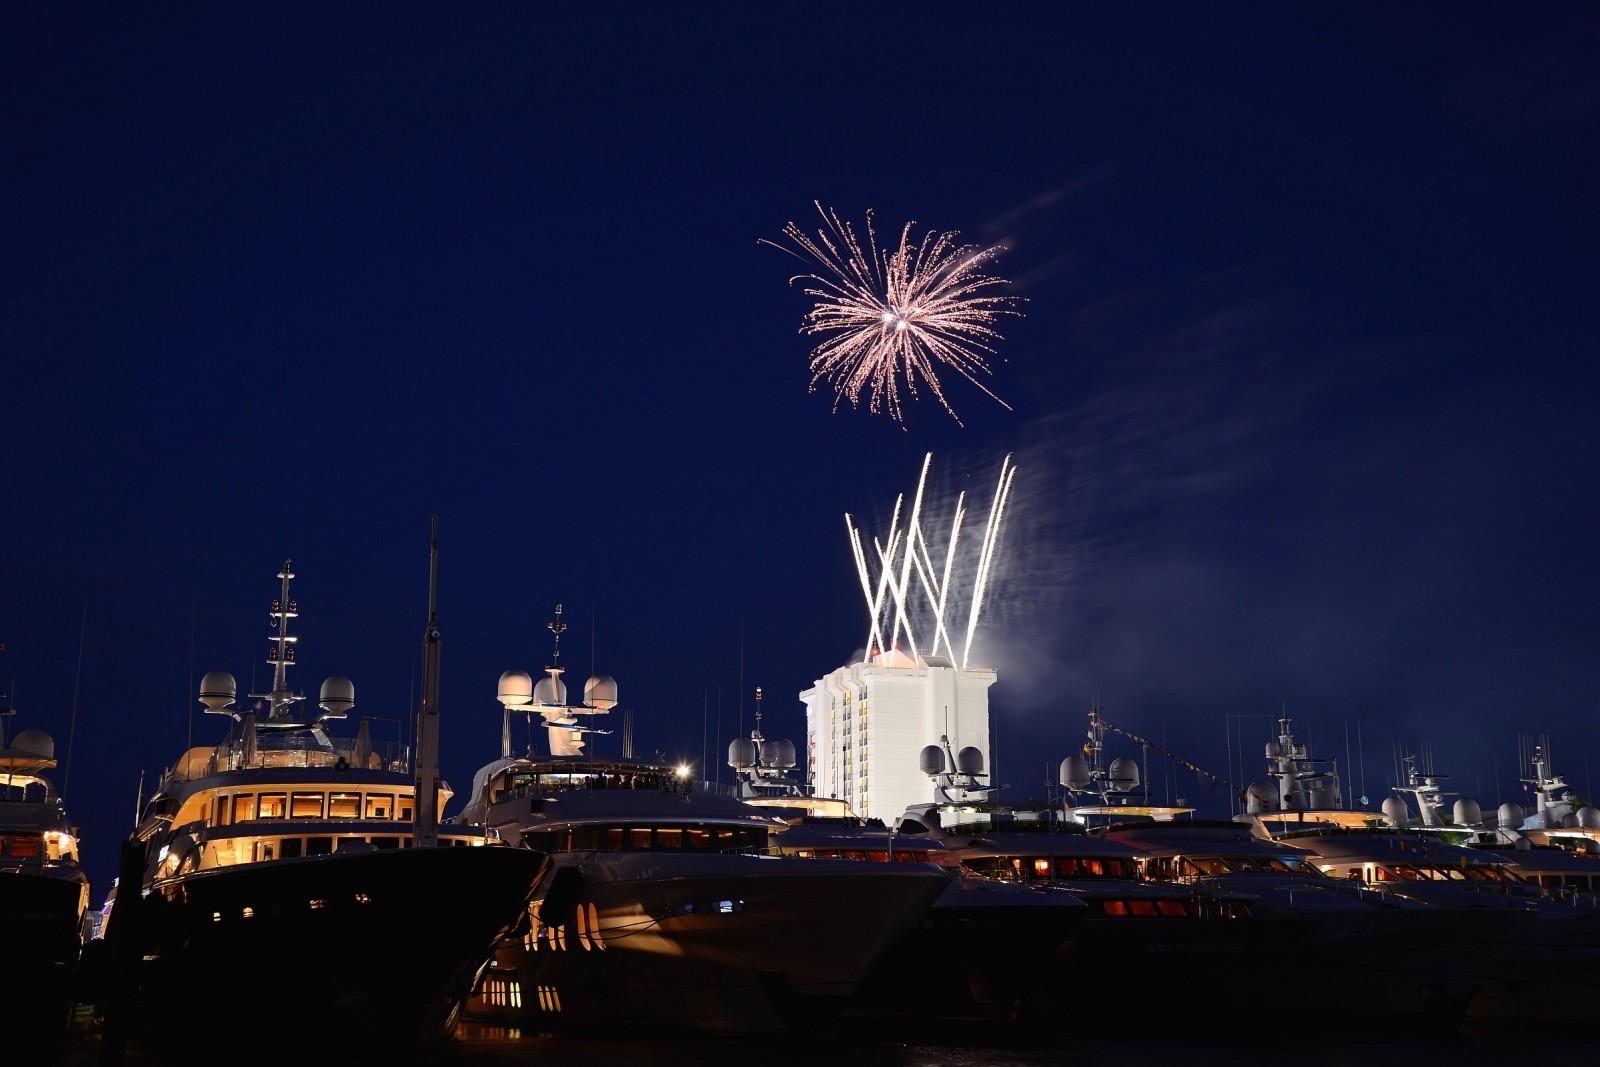 Th Fireworks - DSC_9201.NEF